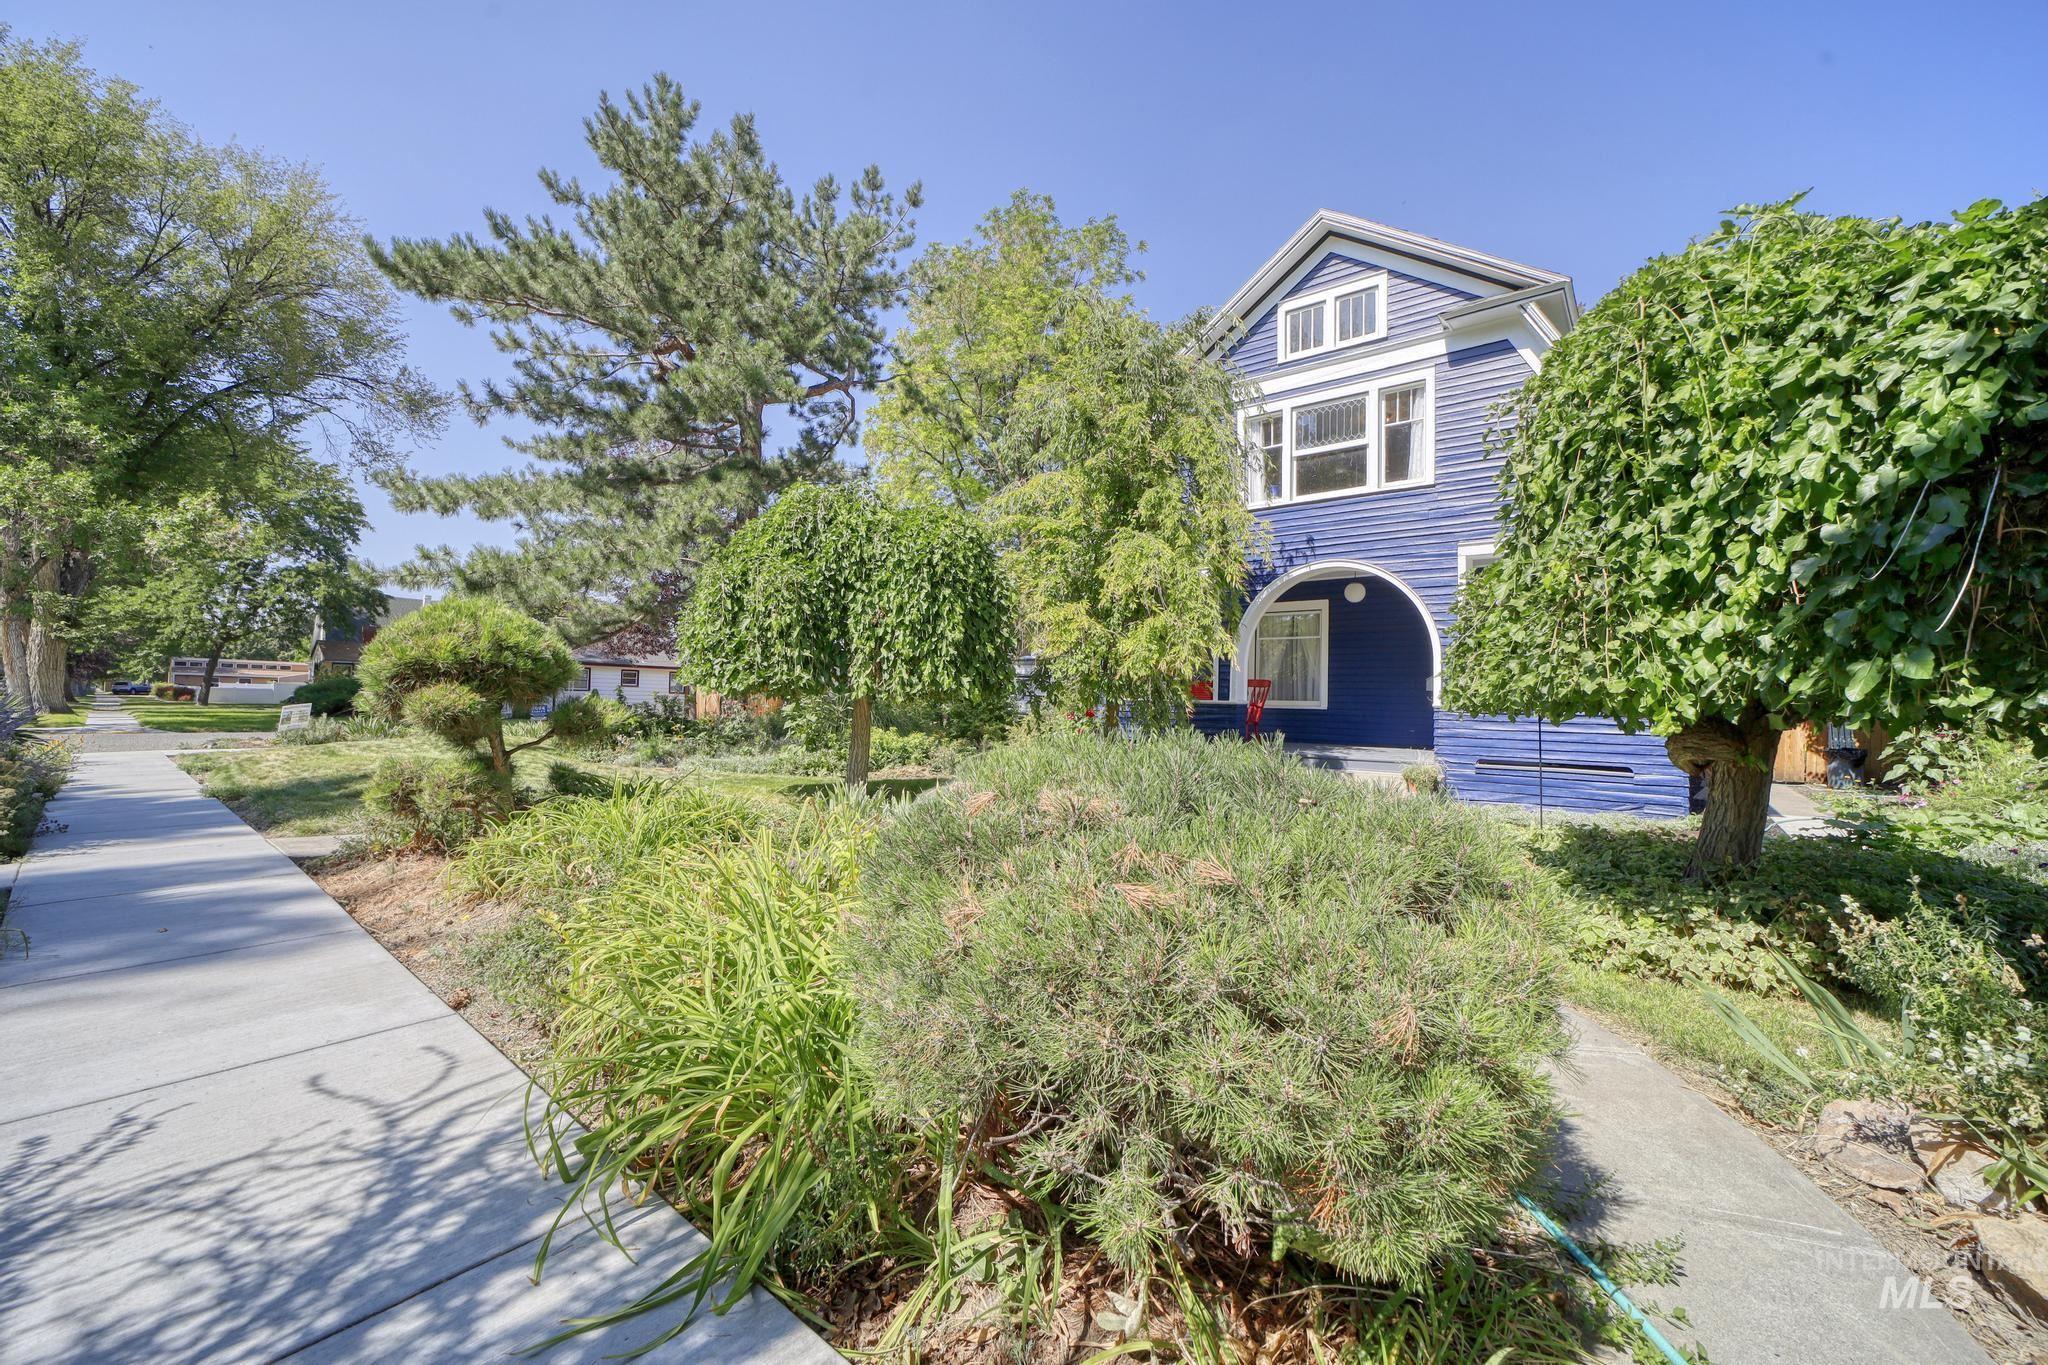 207 8th Ave E Property Photo 2